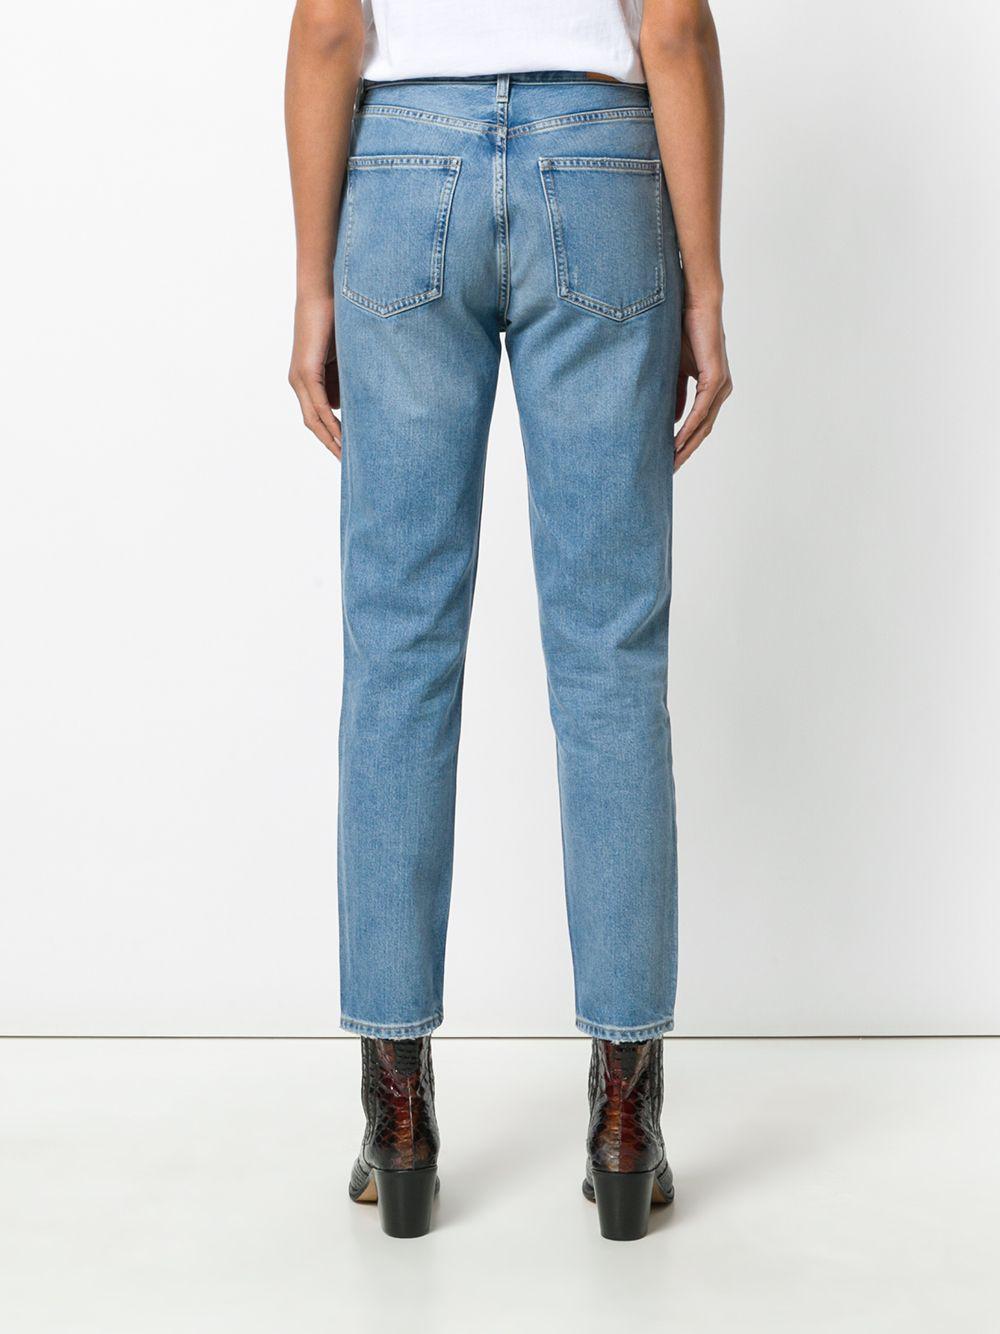 M.I.H Jeans | джинсы 'Mimi Jean' от Chloe Hill | Clouty